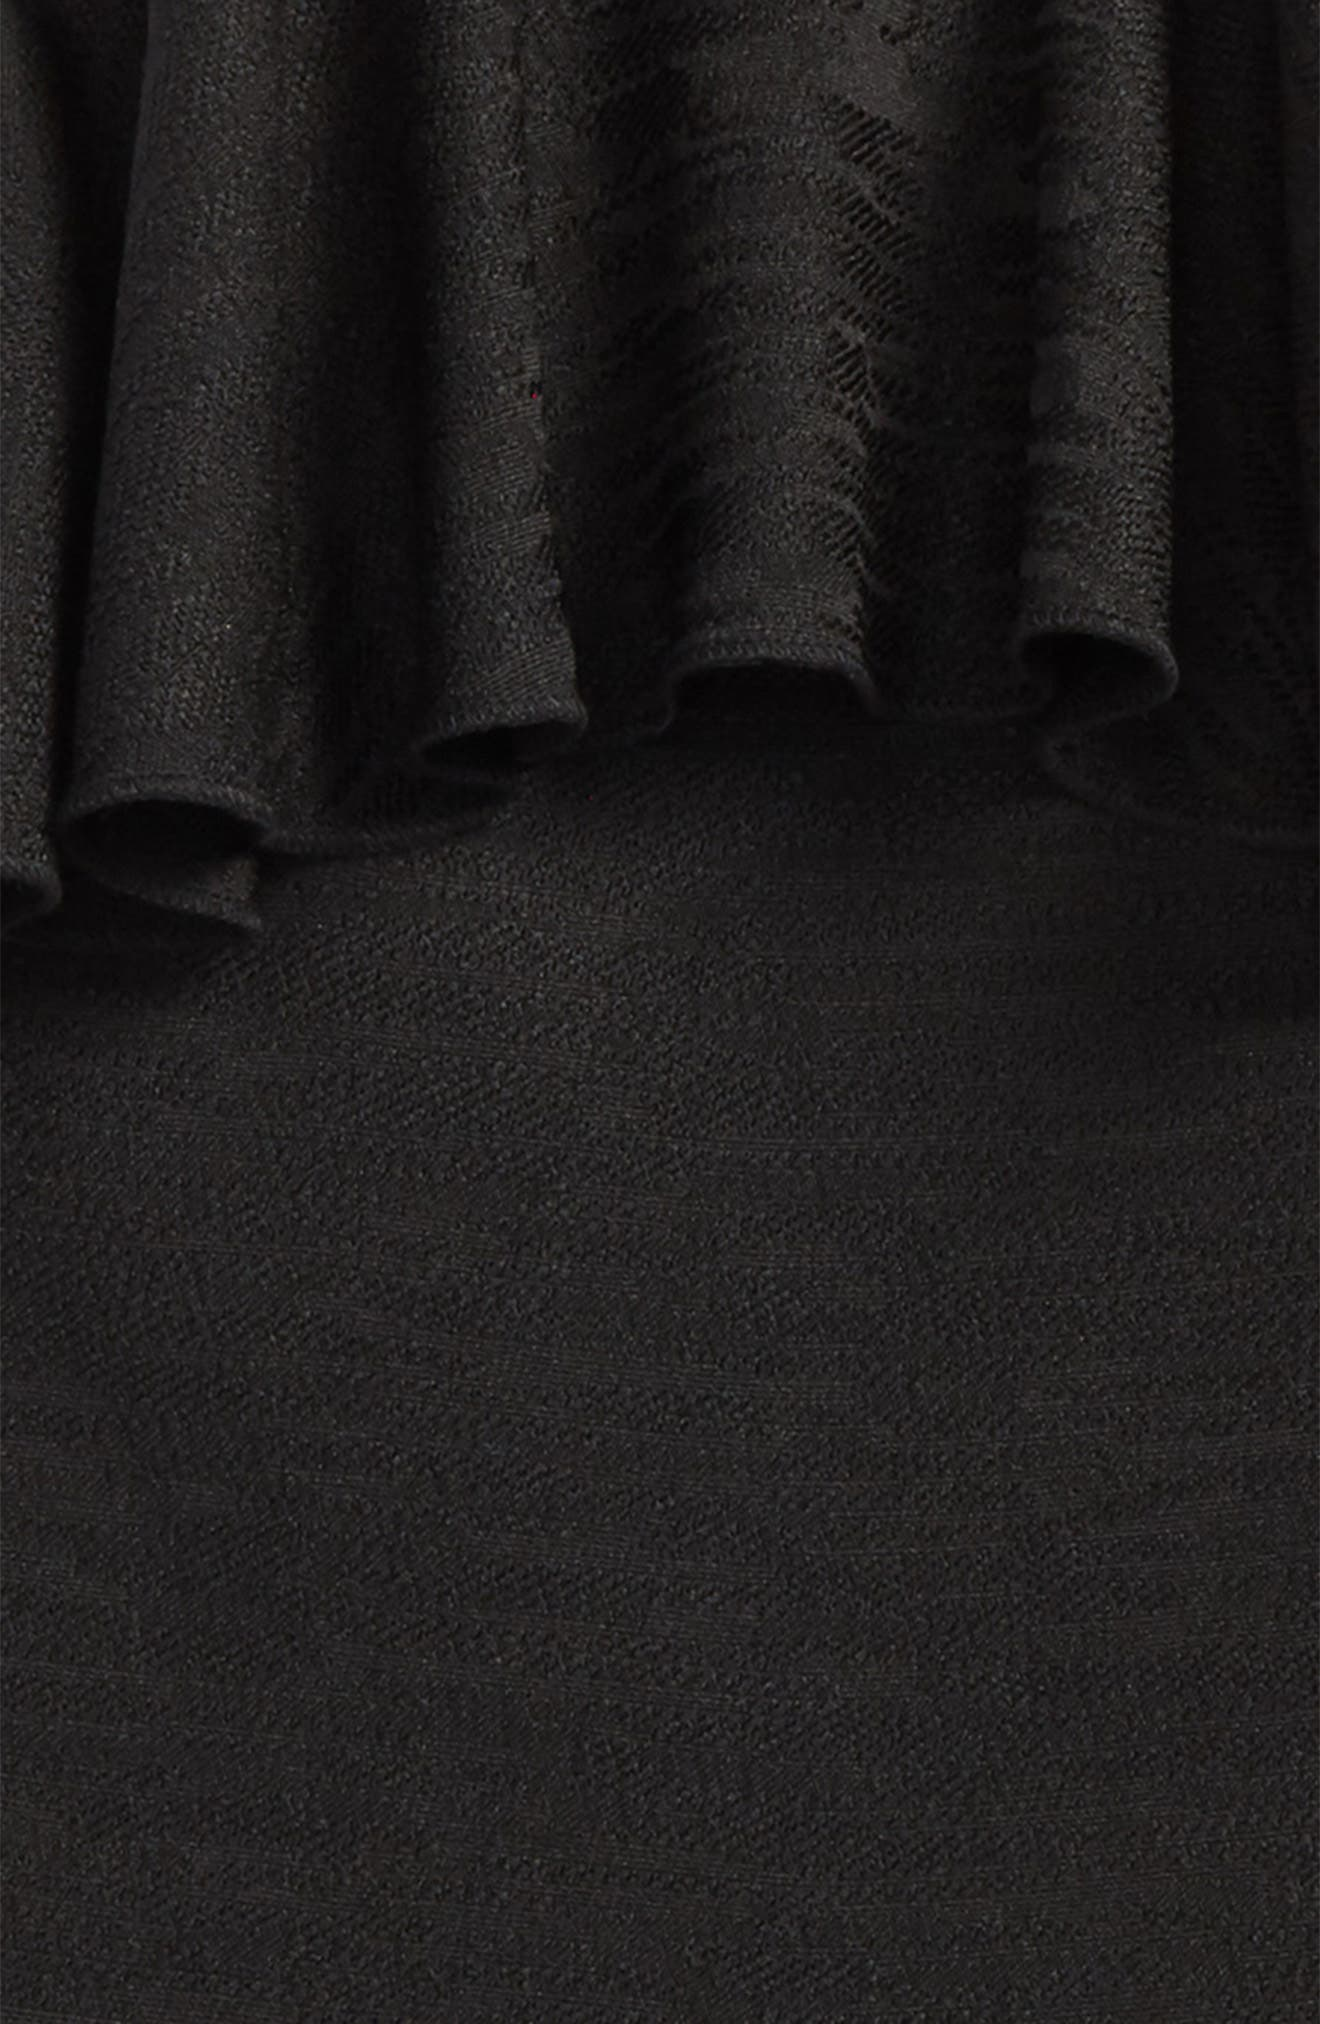 Rona Ruffle Halter Romper,                             Alternate thumbnail 2, color,                             Black